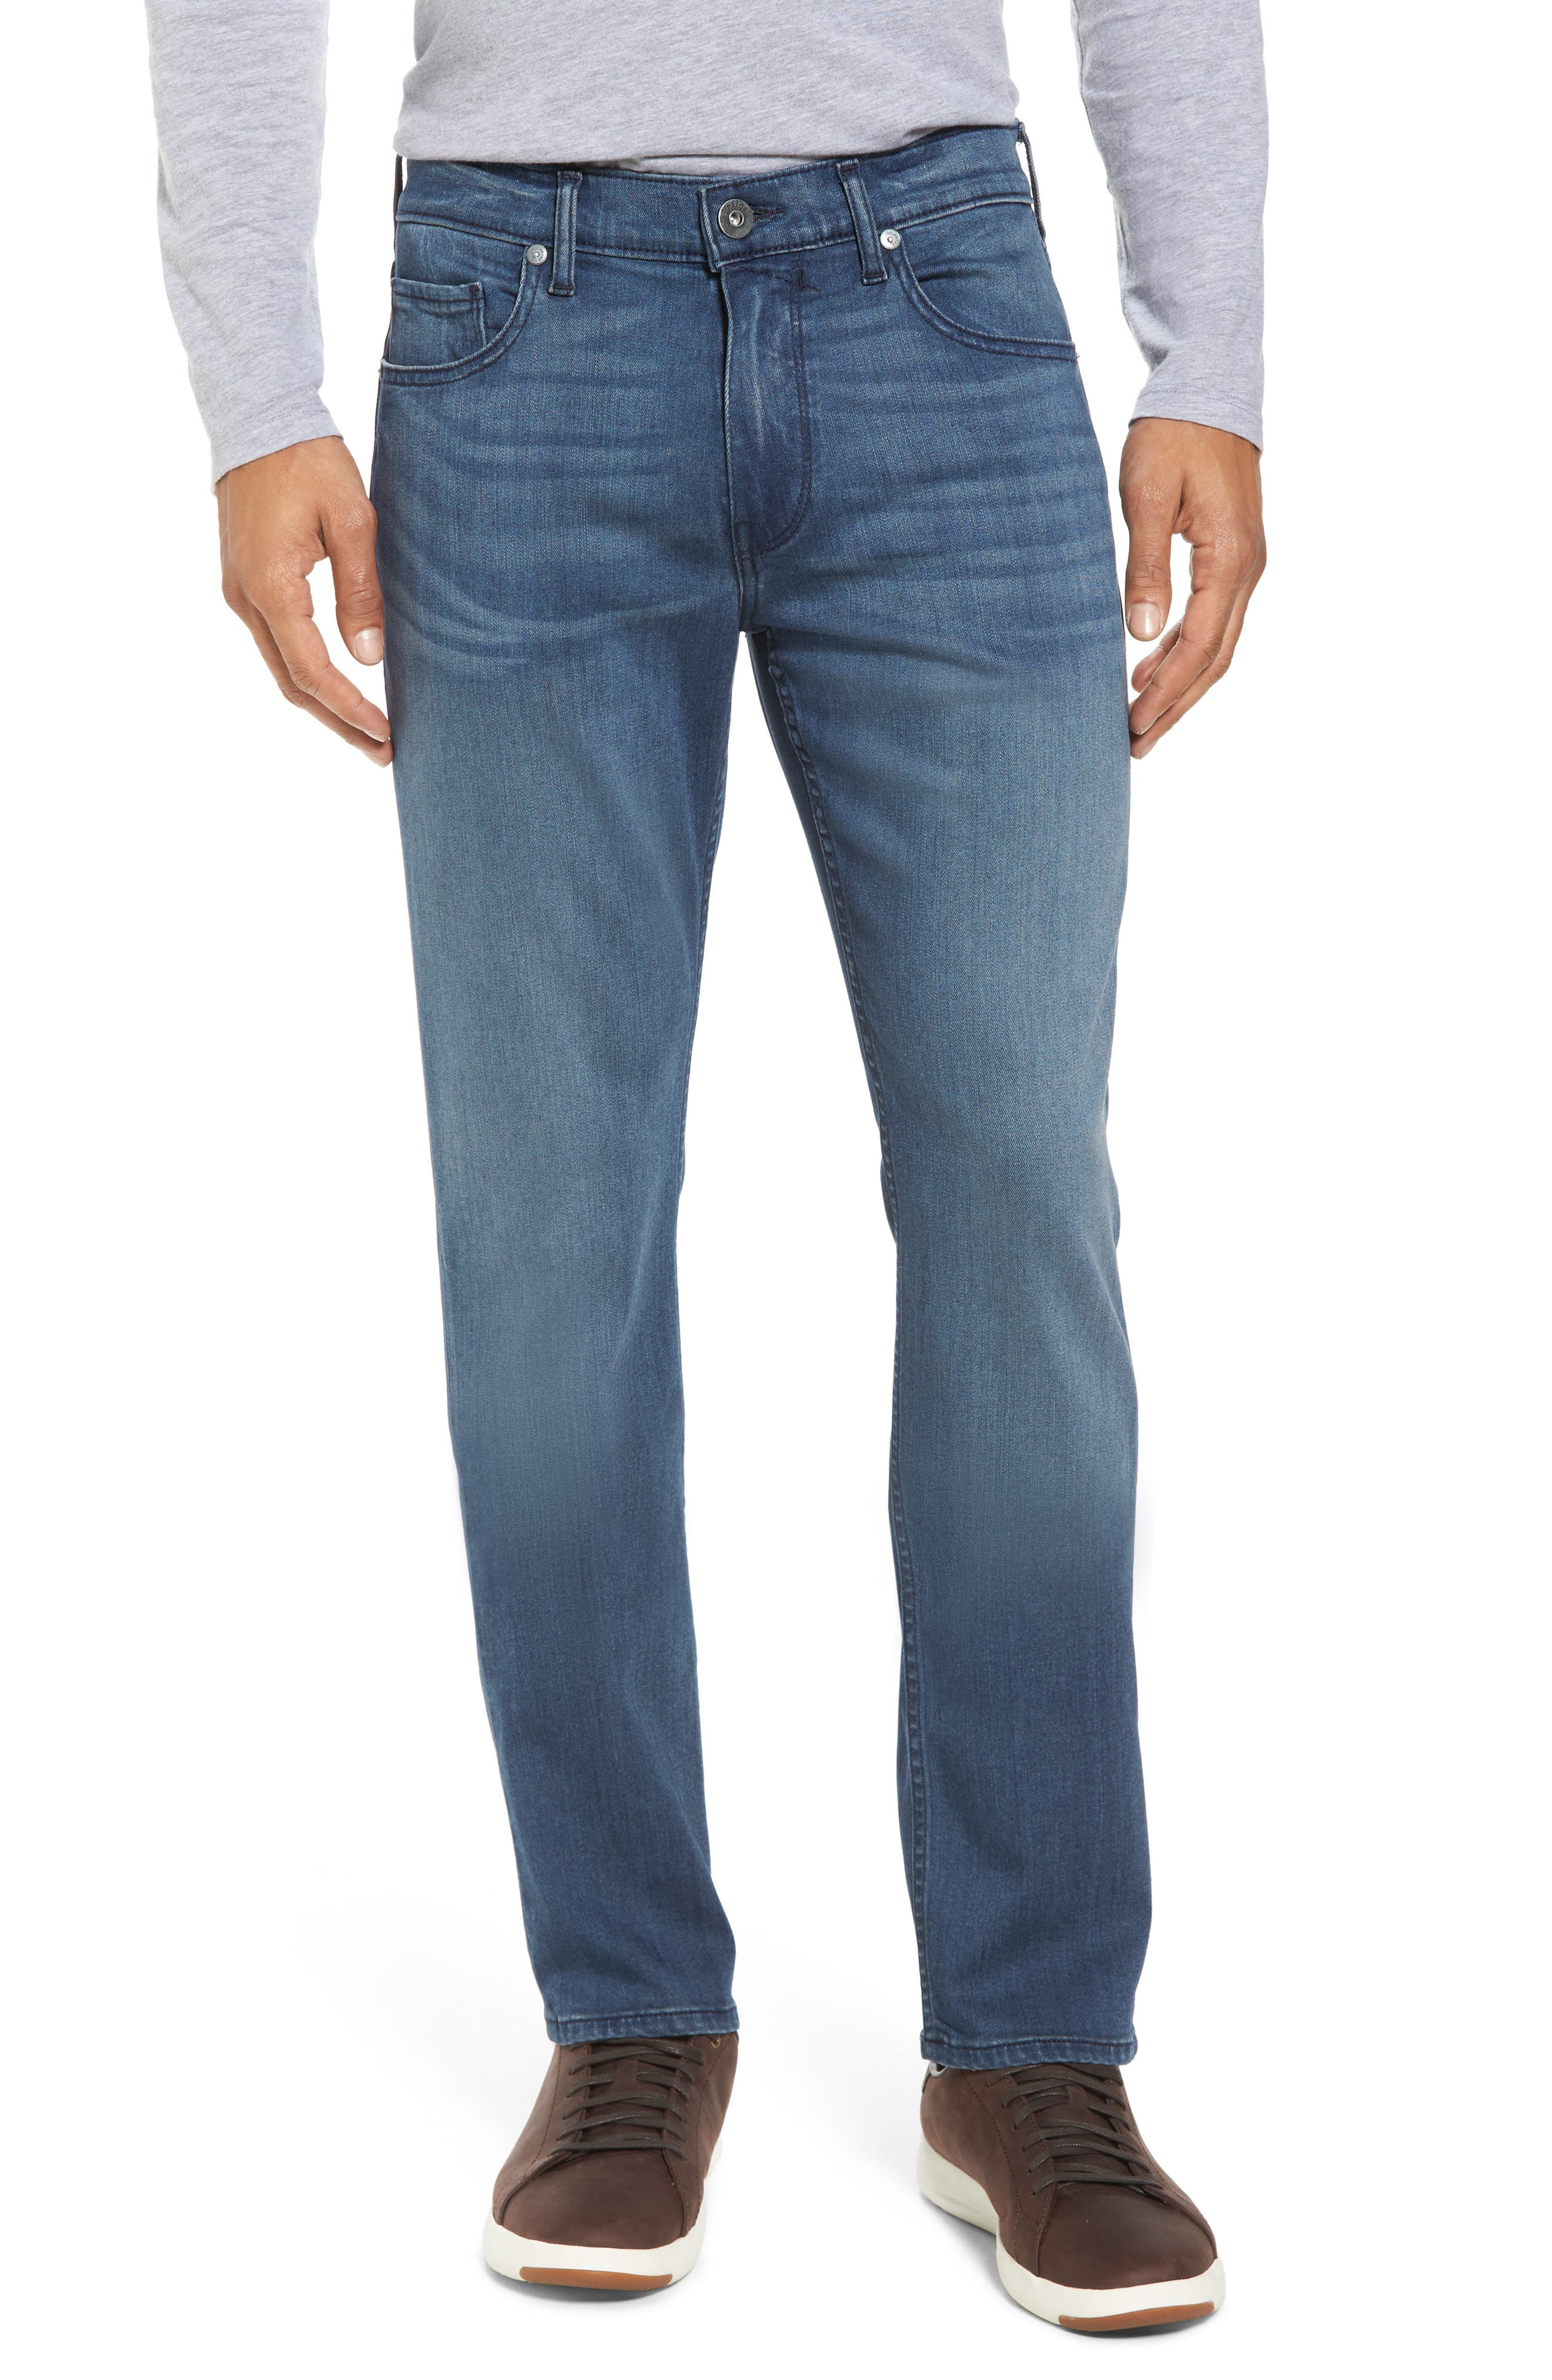 Main Image - PAIGE Transcend - Federal Slim Straight Fit Jeans (Skyler)